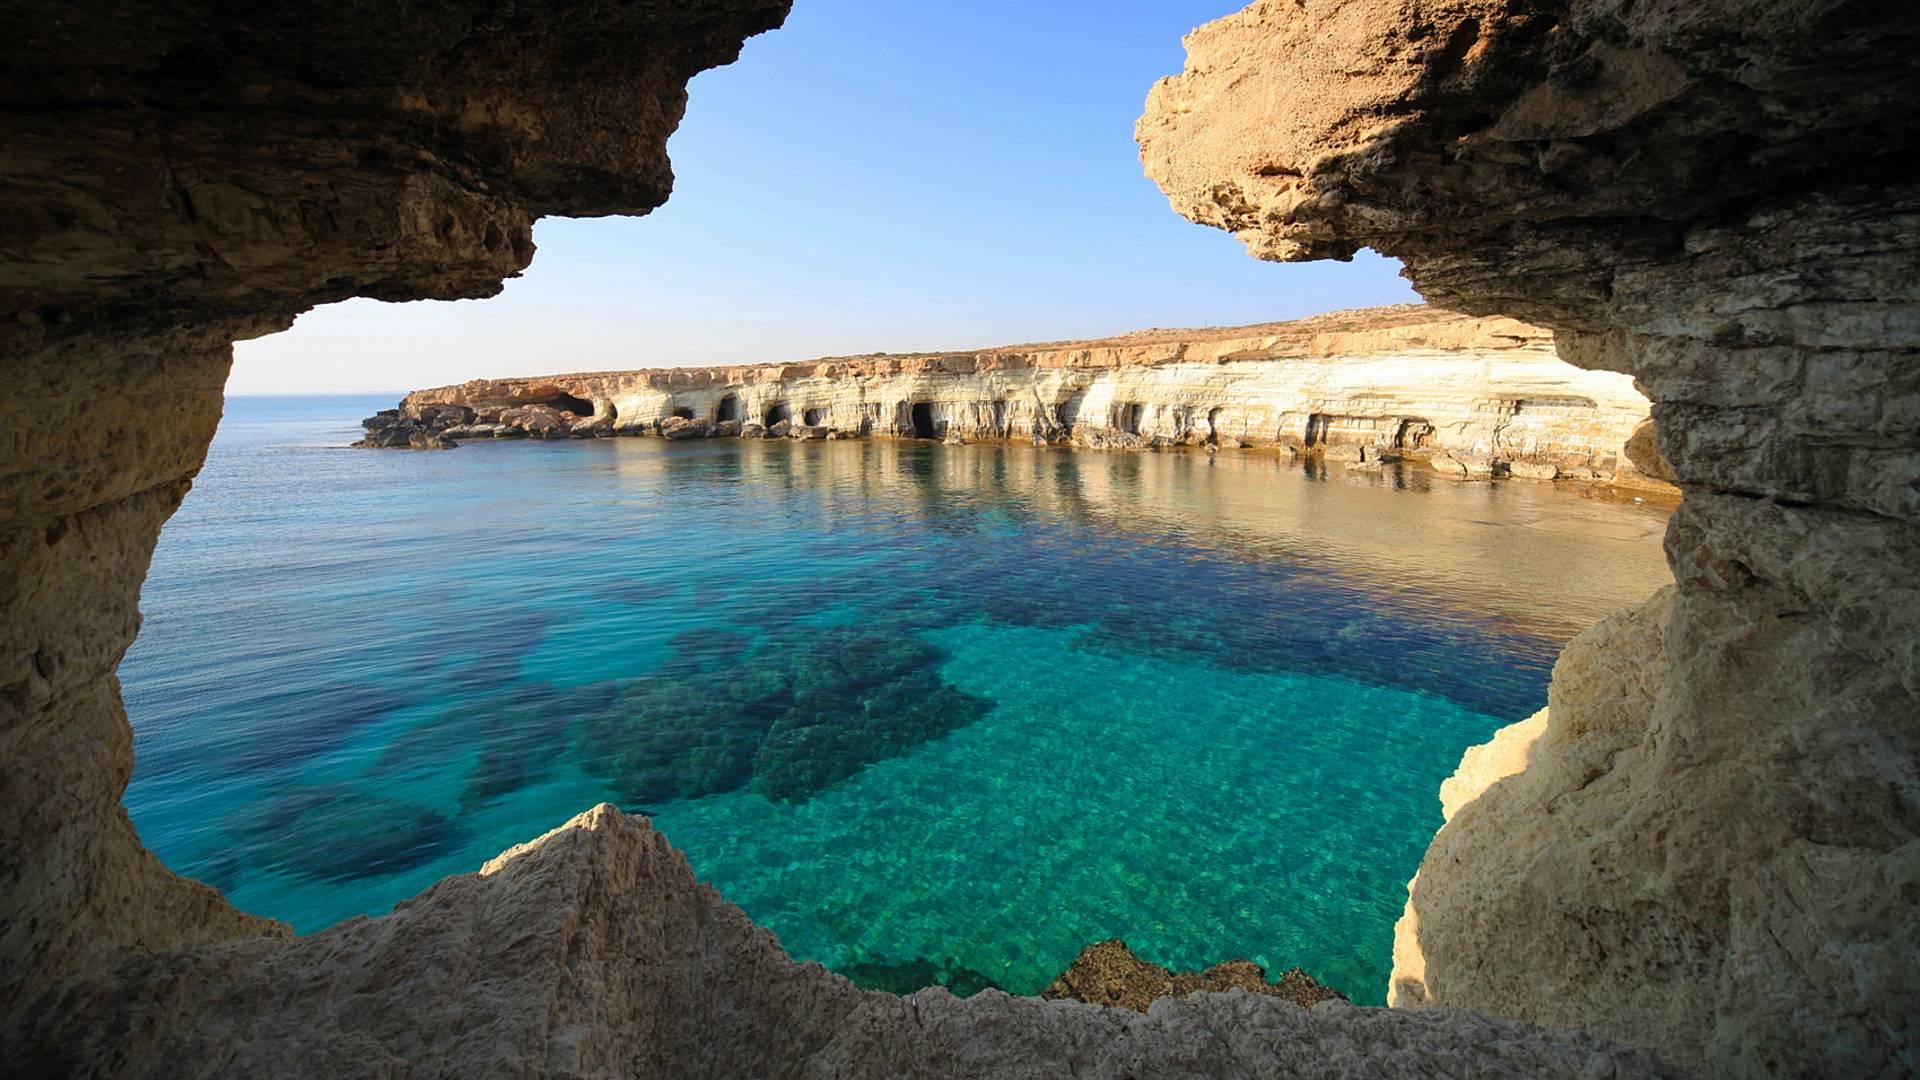 Ocean View Wallpapers - Wallpaper Cave